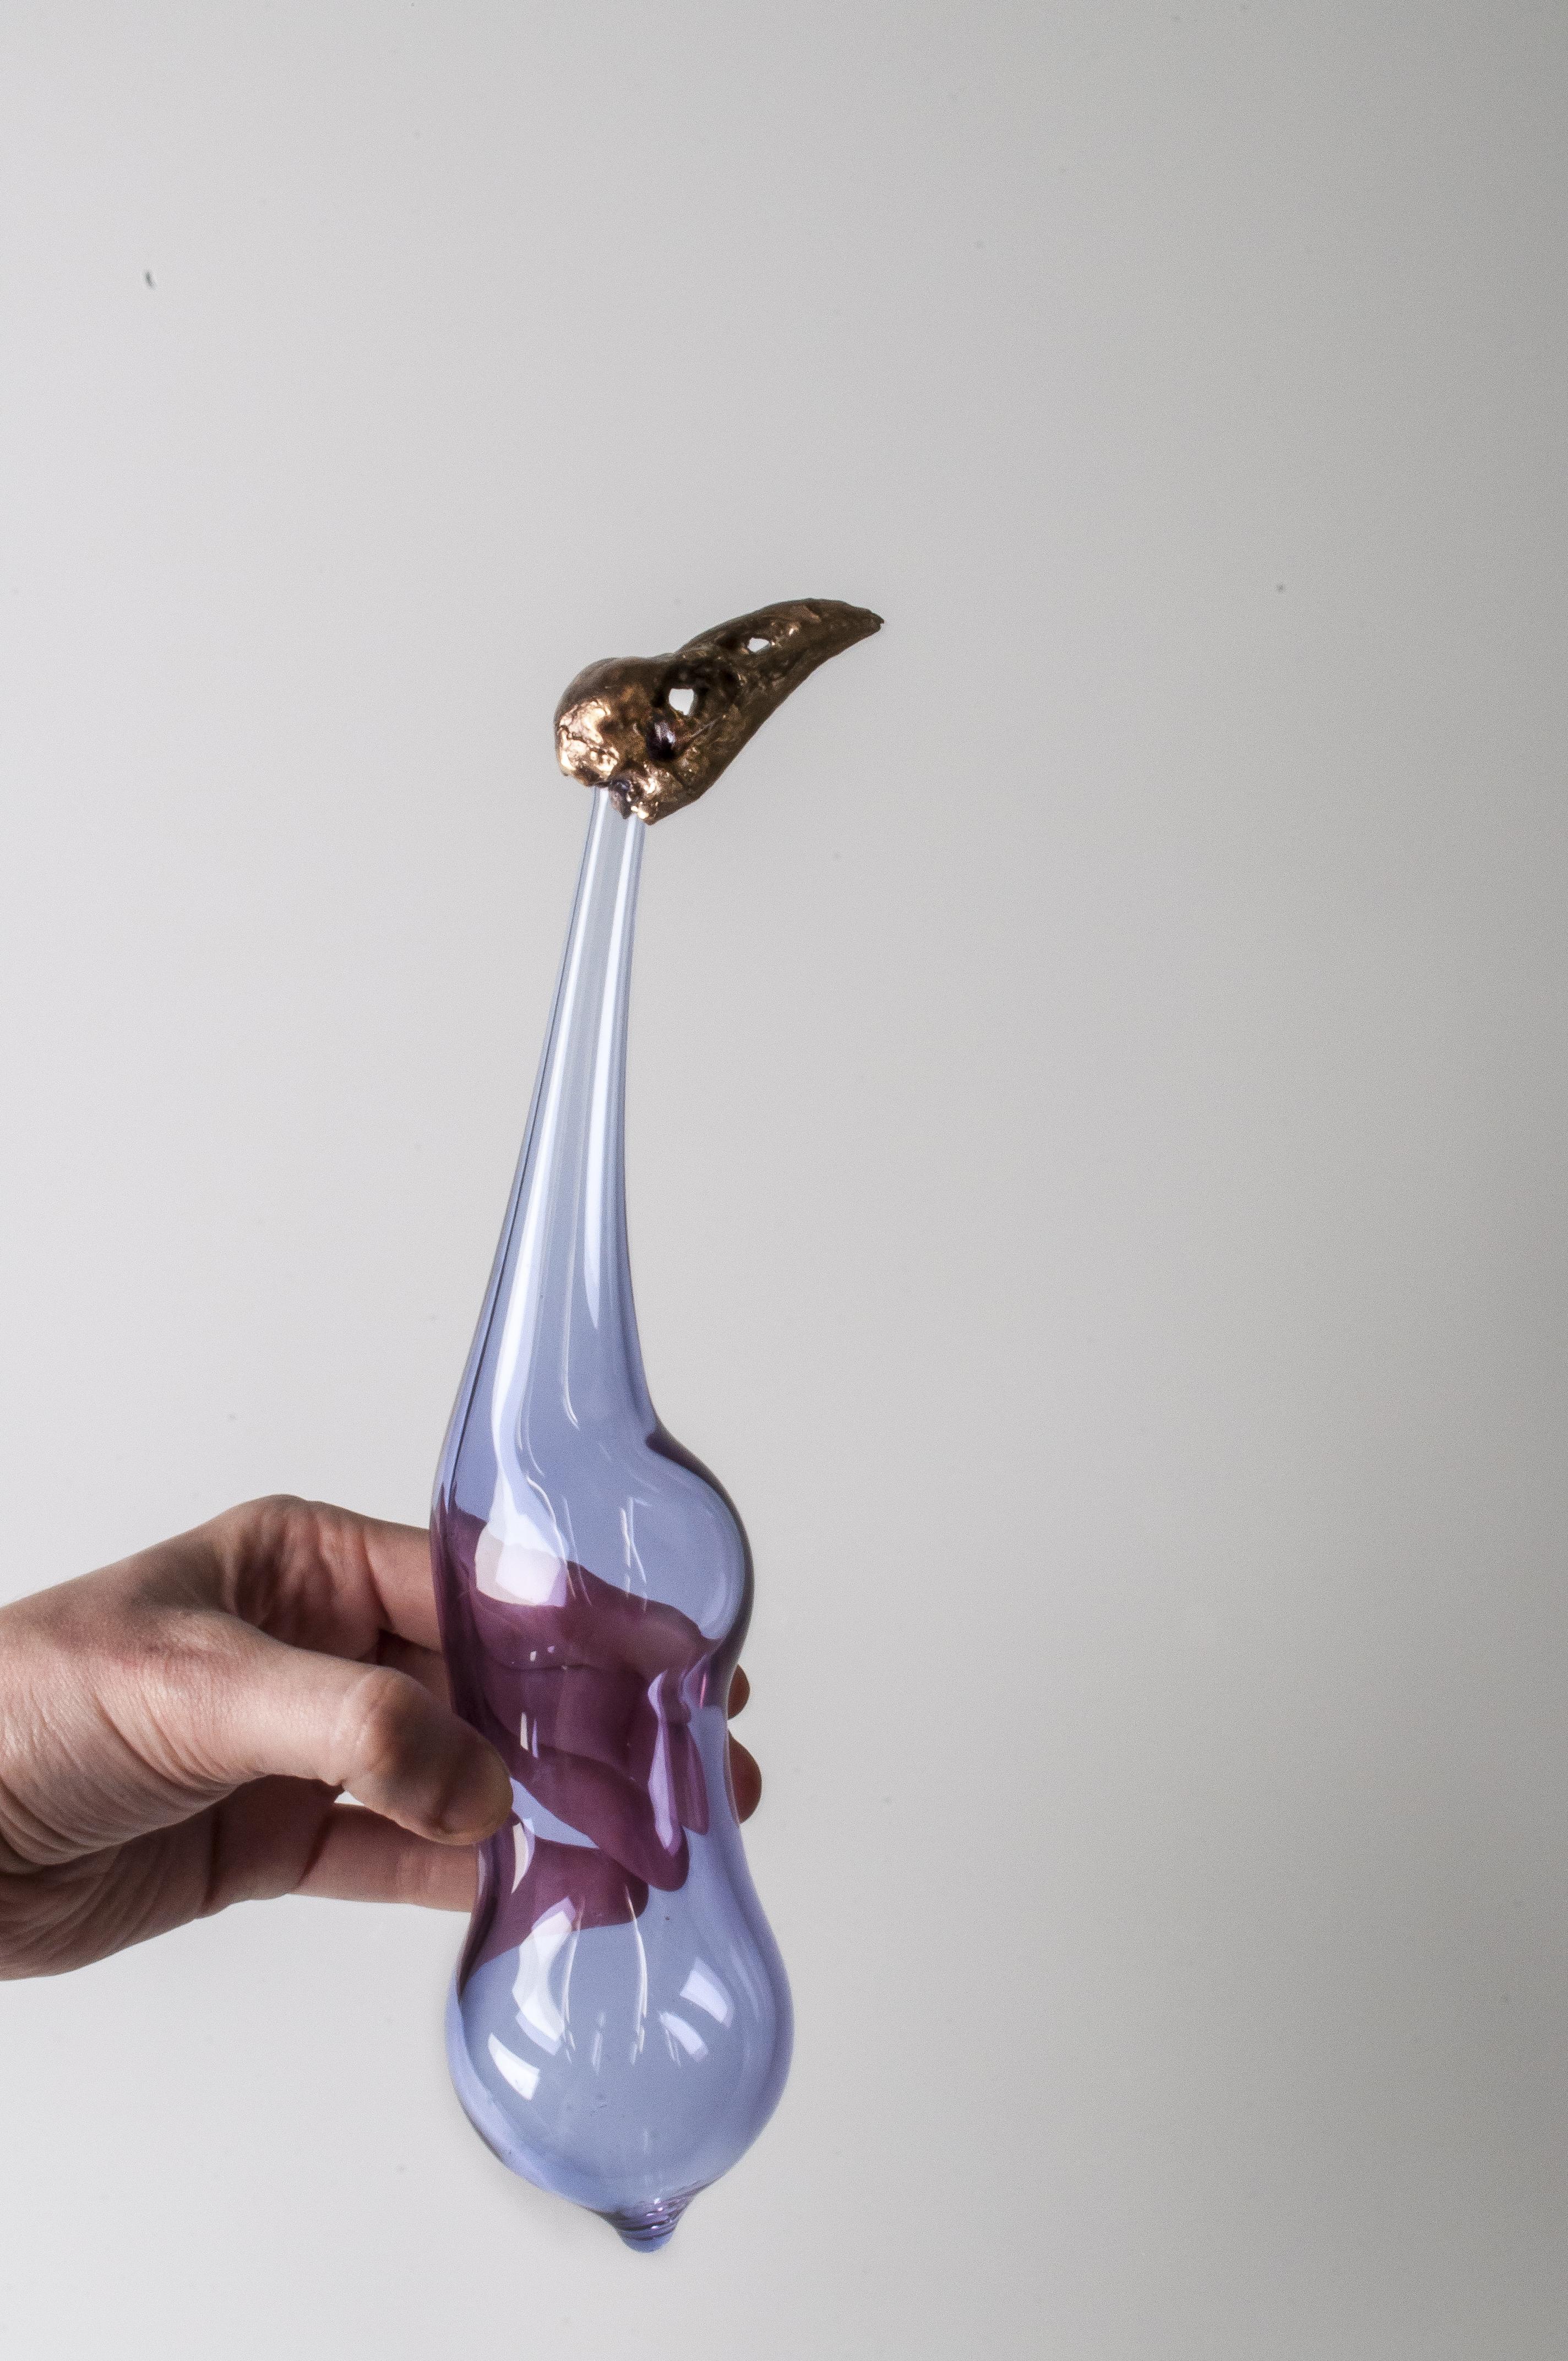 Madeli Viljoen - Muliebris leucomelas - Object (borosilicate glass, bronze, 2020, 22cmx7cm)